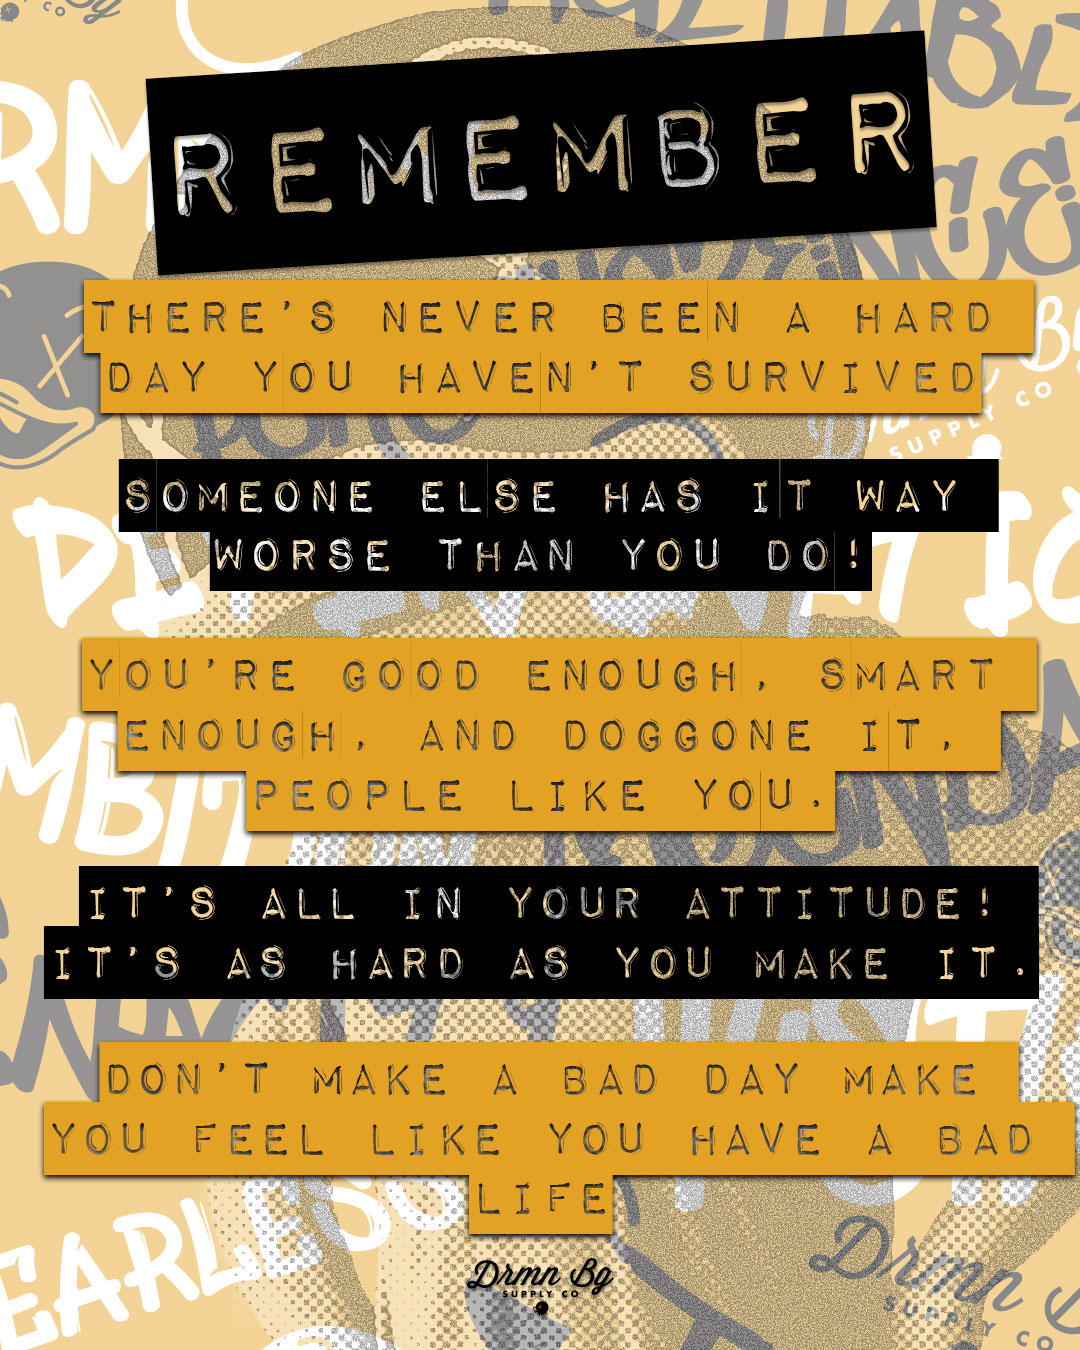 [Image] Reminders